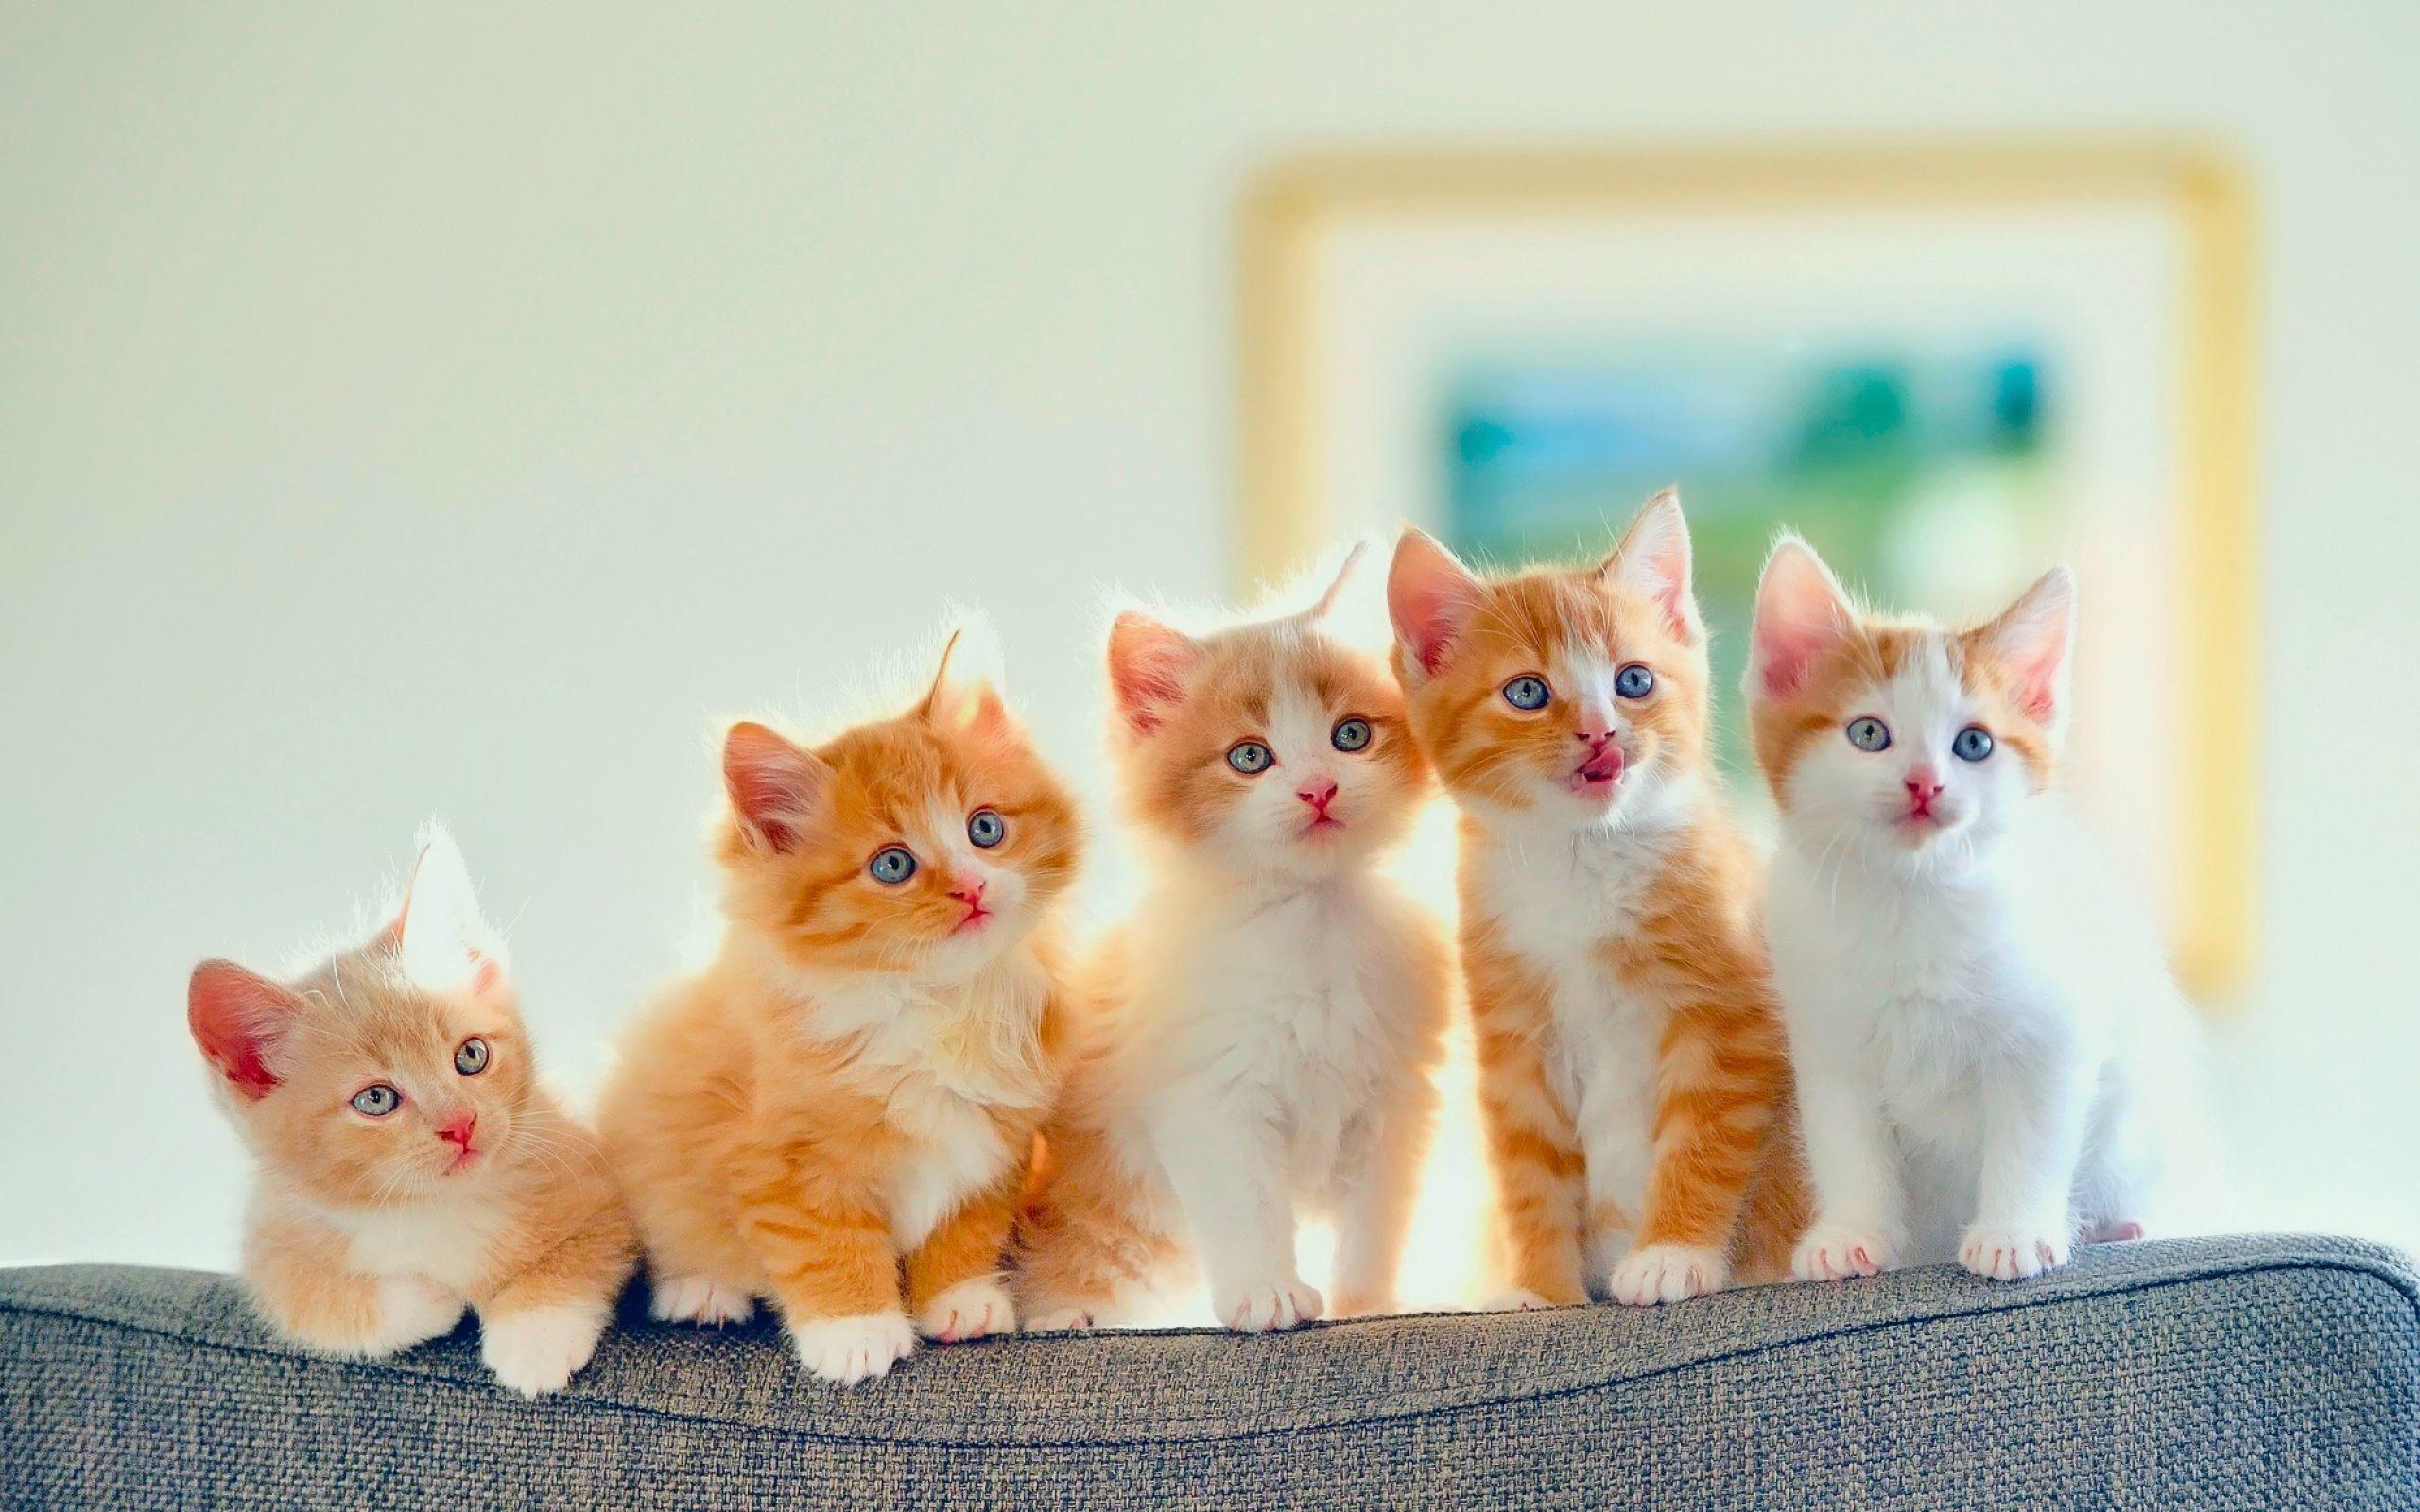 Res: 2560x1600, Cute Cats Wallpaper Download For Desktop, PC & Mobile